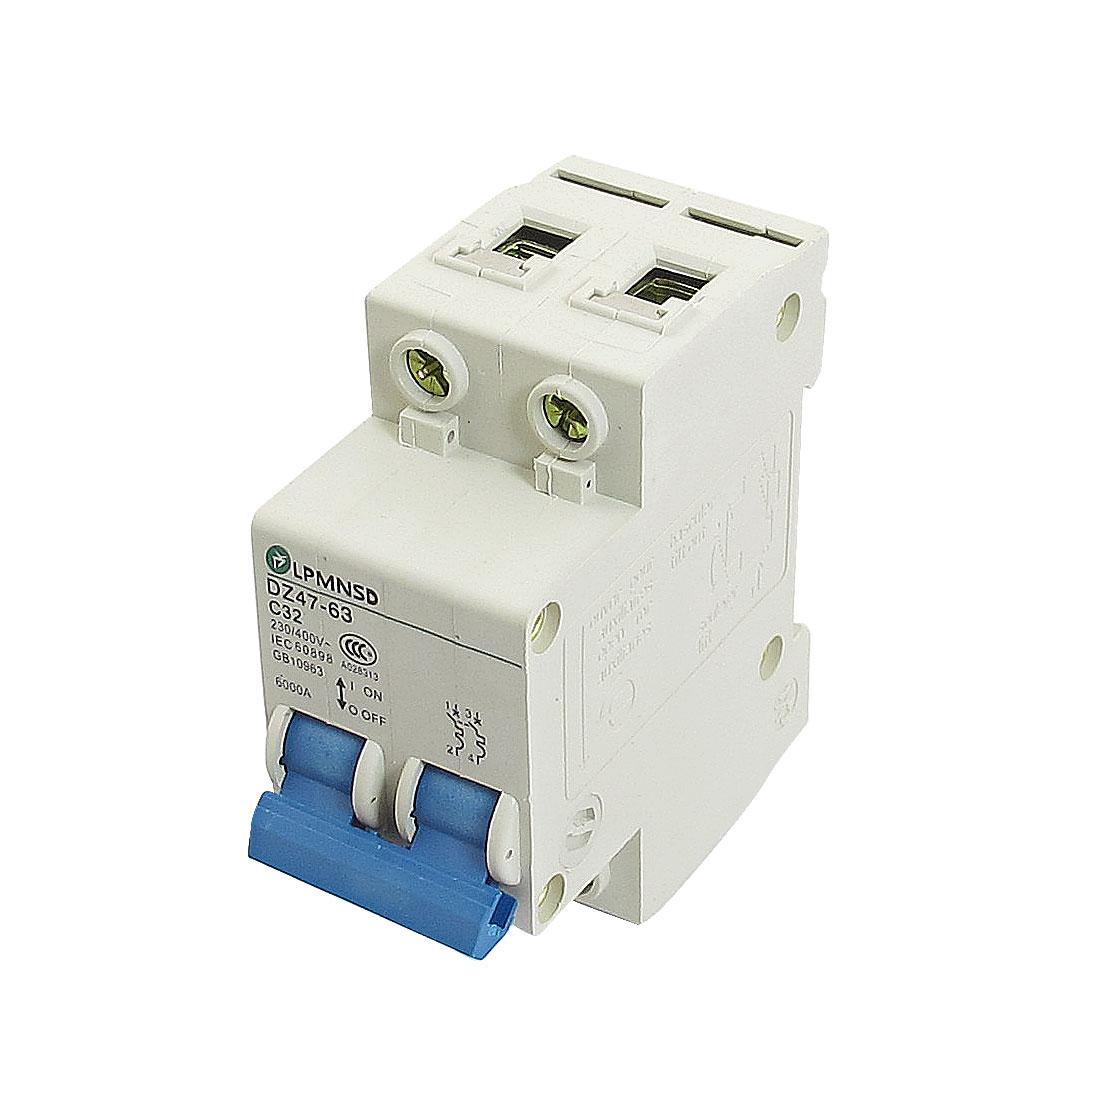 DZ47-63 C32 32A 230/400VAC 6000A Breaking Capacity 2 Poles Circuit Breaker